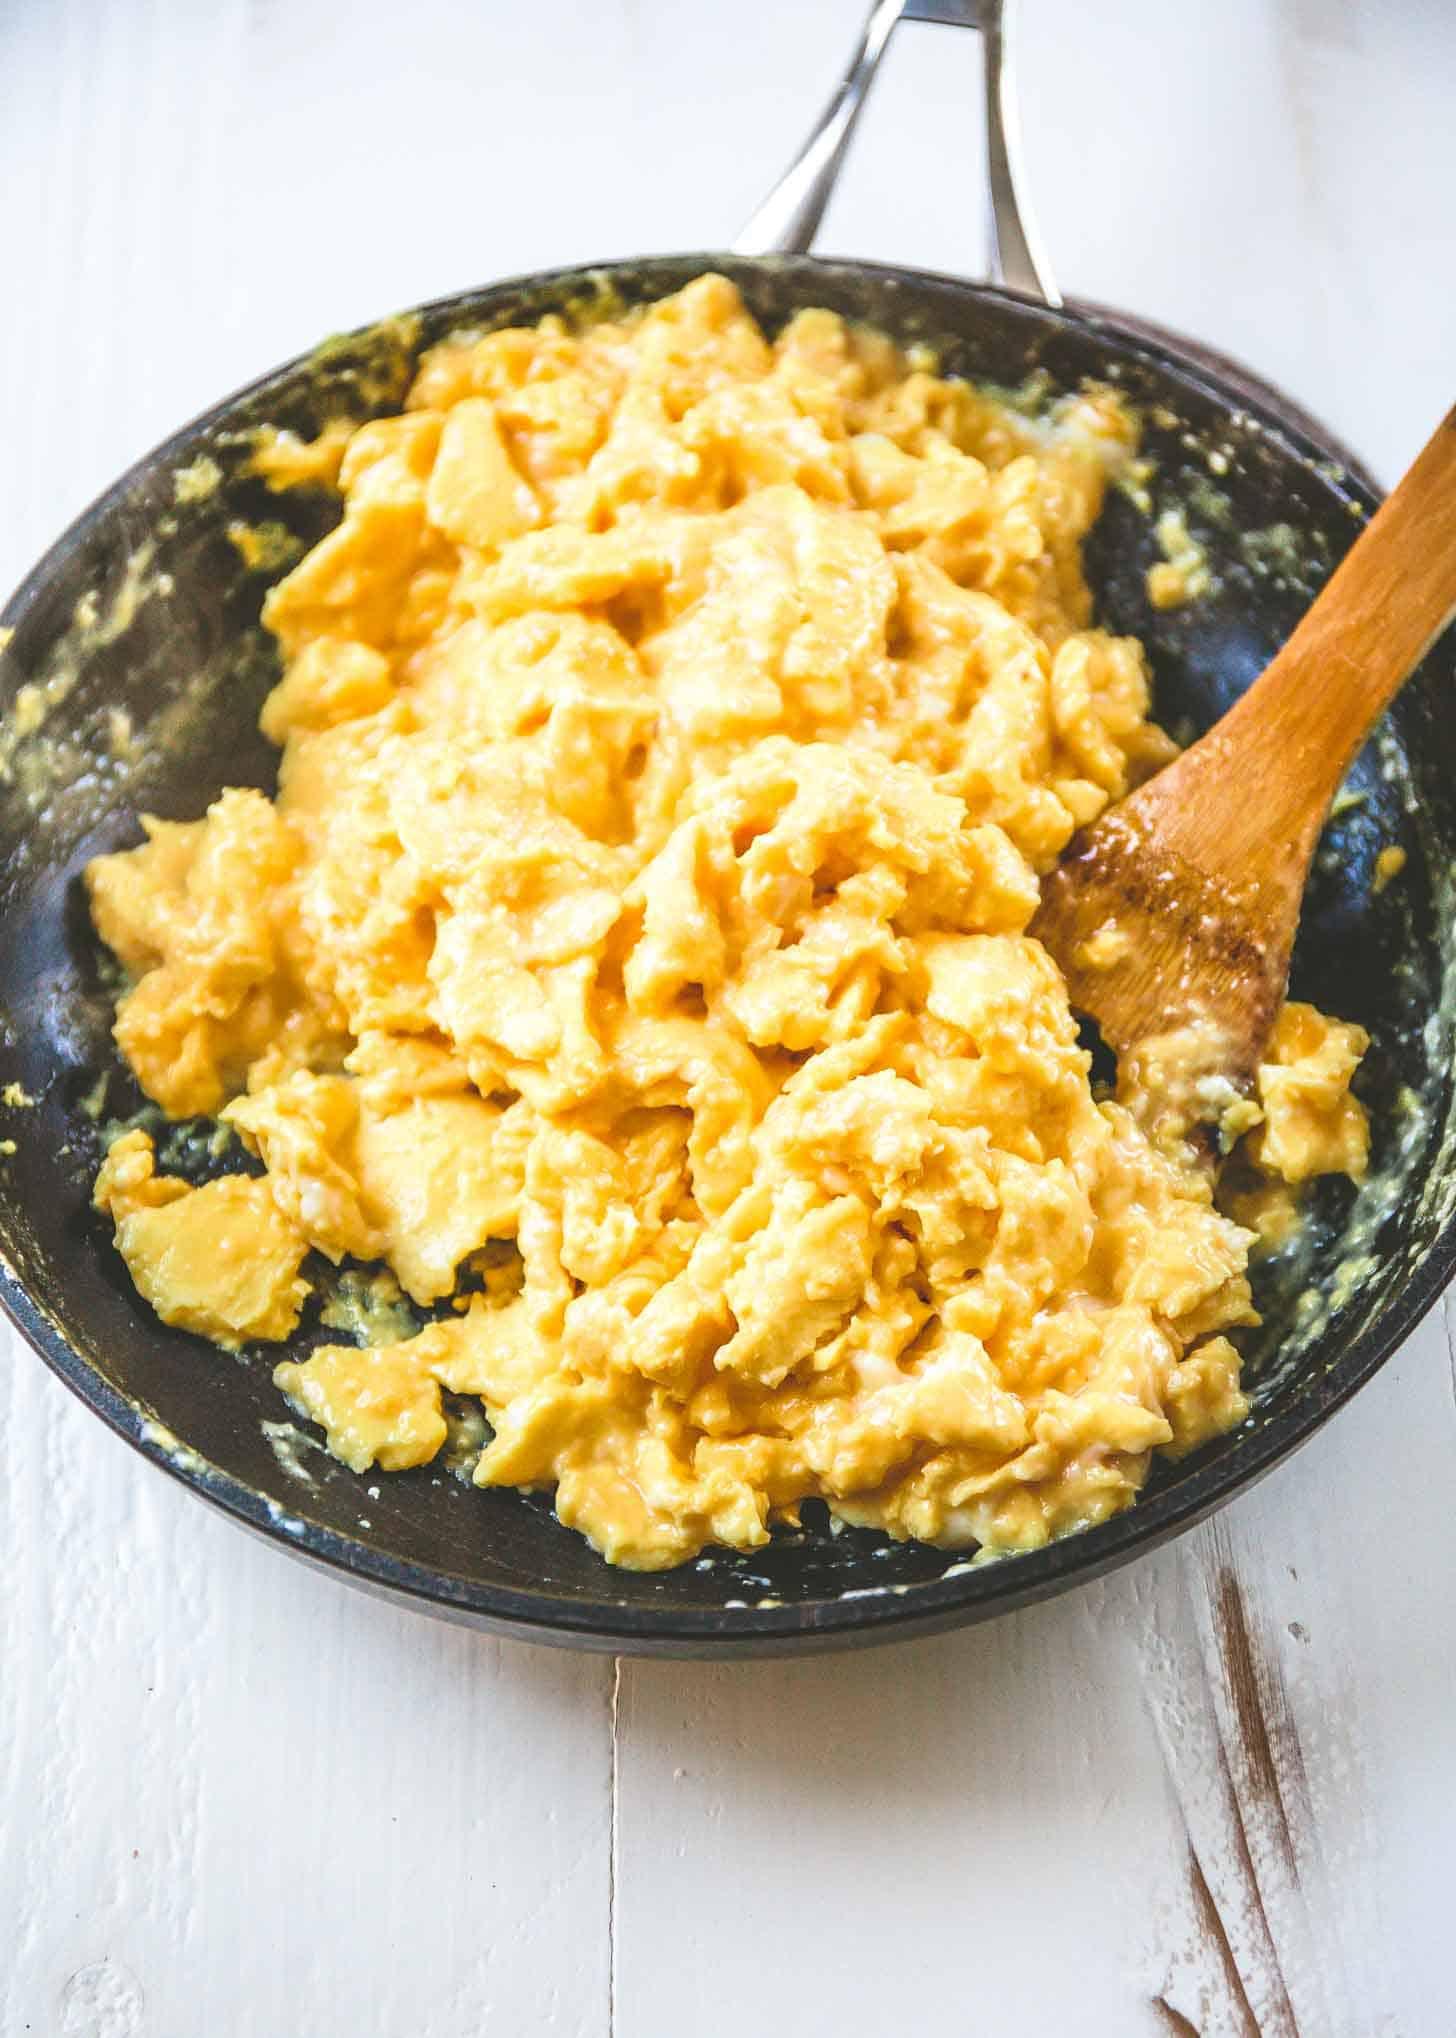 scrambling eggs in a skillet